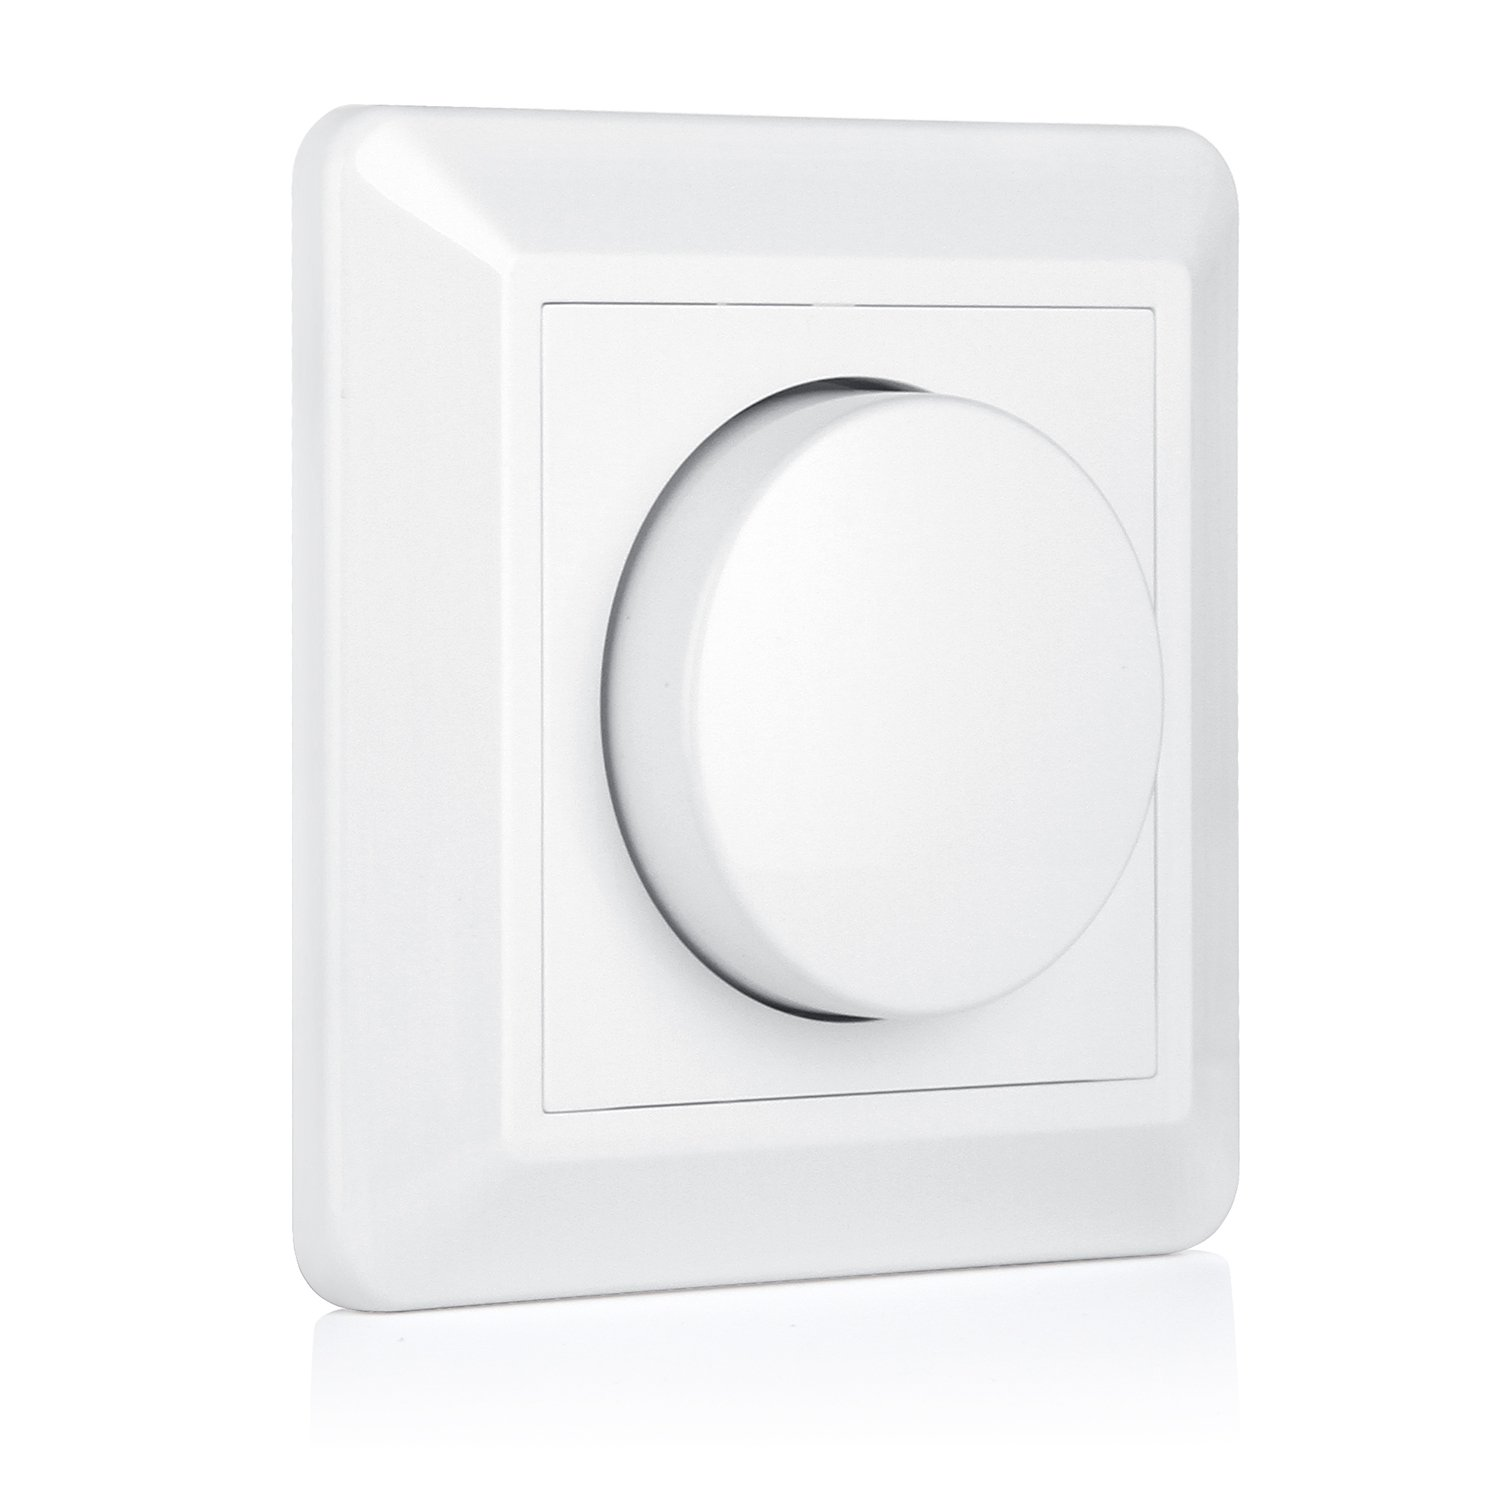 VIPMOON 220-240V 5-200W Push-On/Off Rotary LED Dimmer Switch EU-P3 para bombillas Led Luz de techo